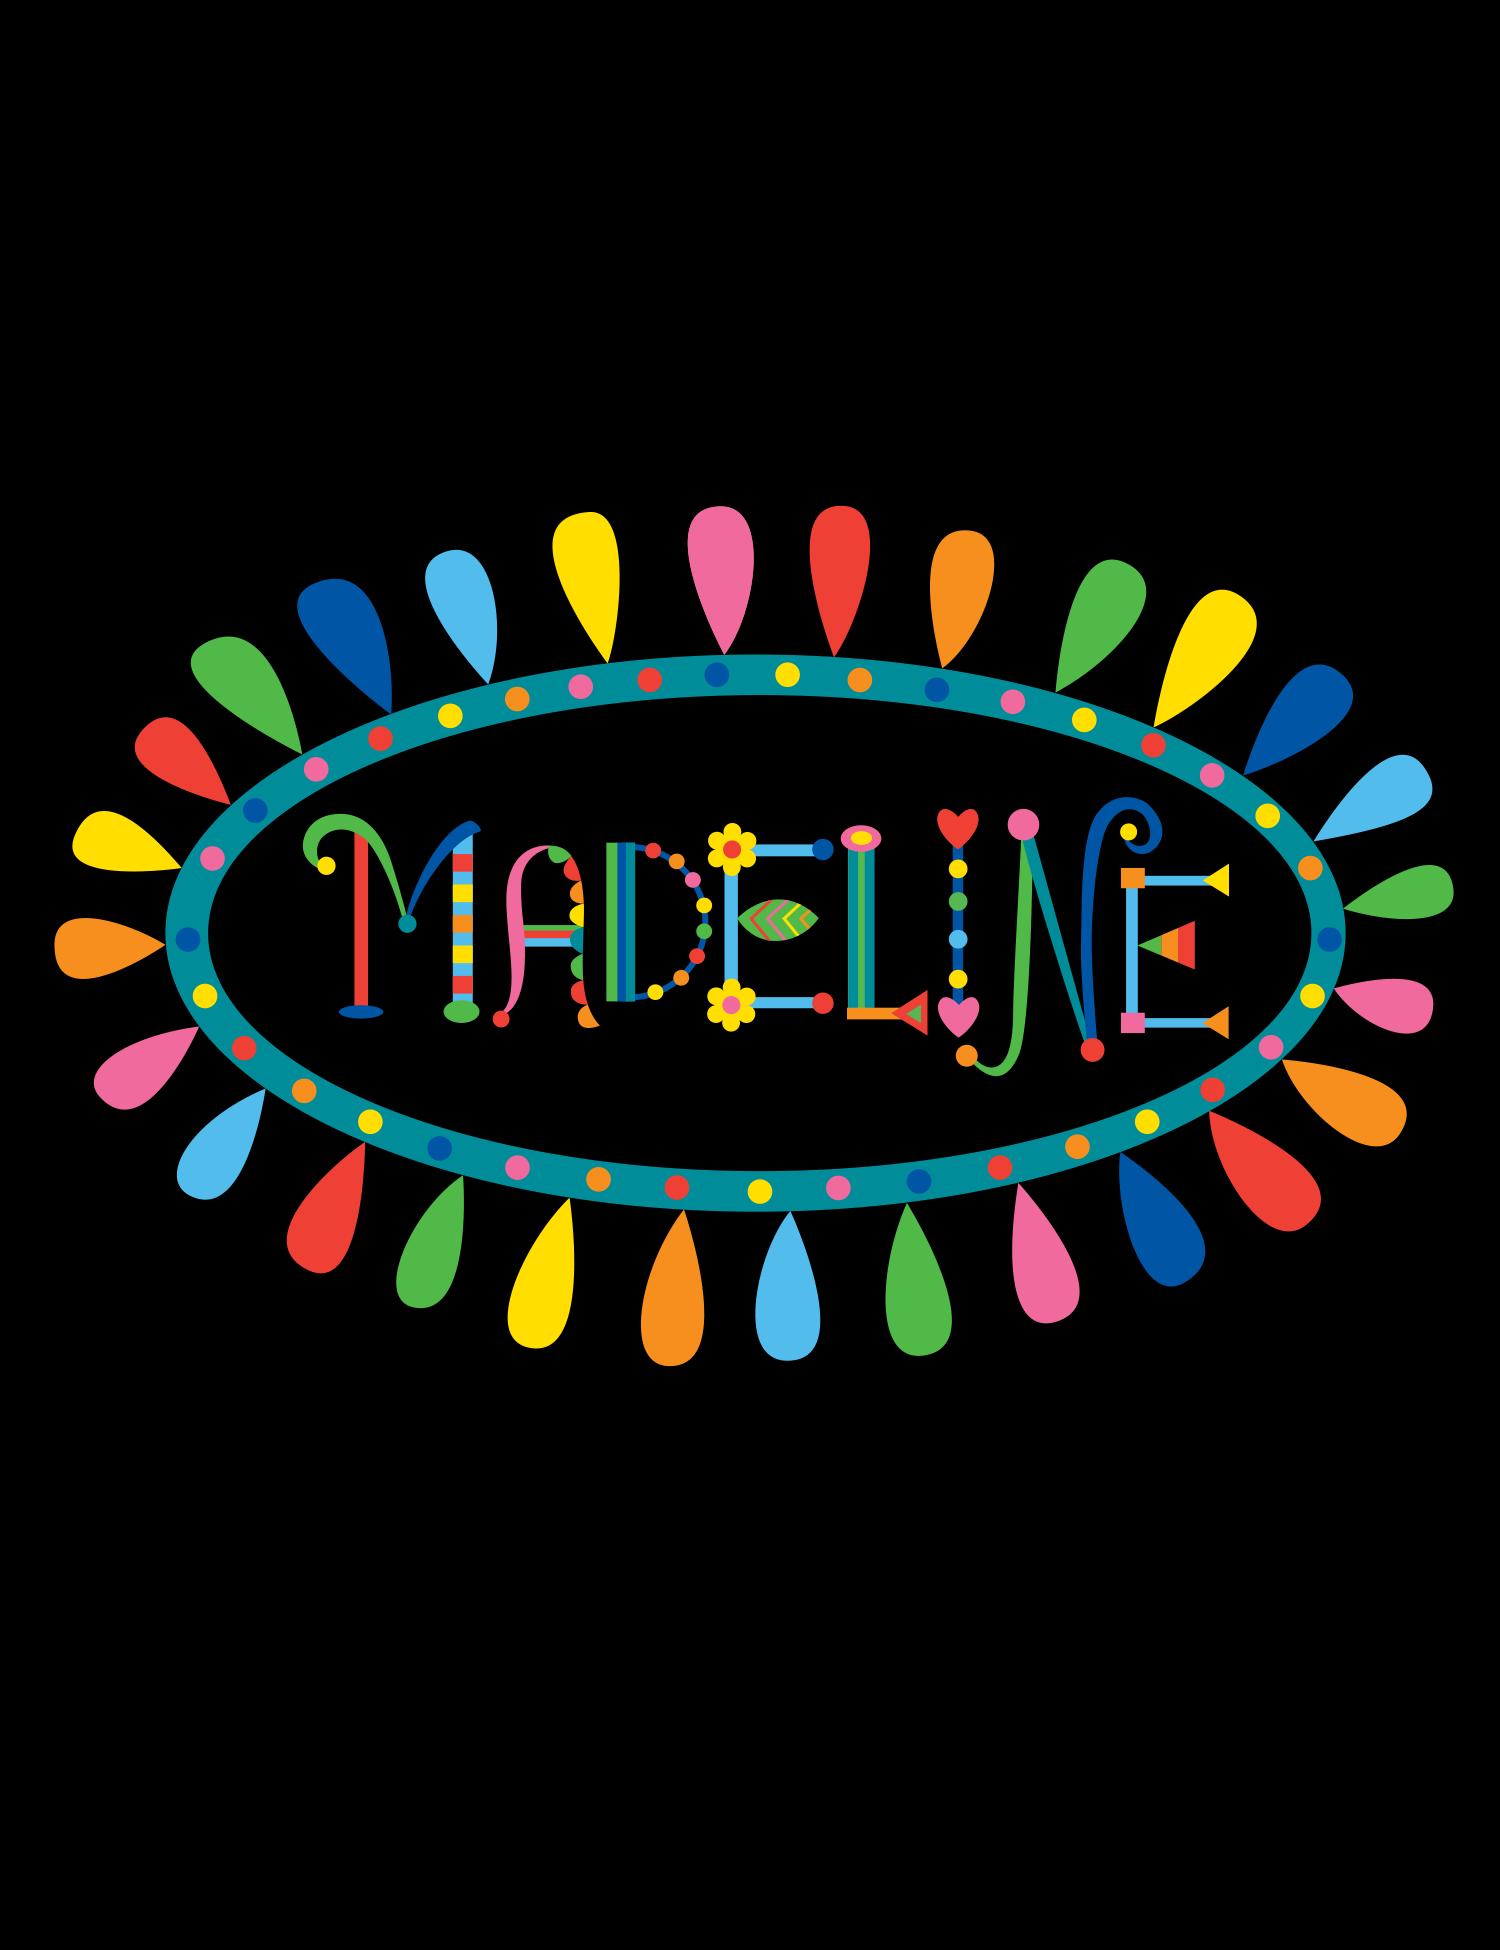 madeline_name_type_andi_bird.png